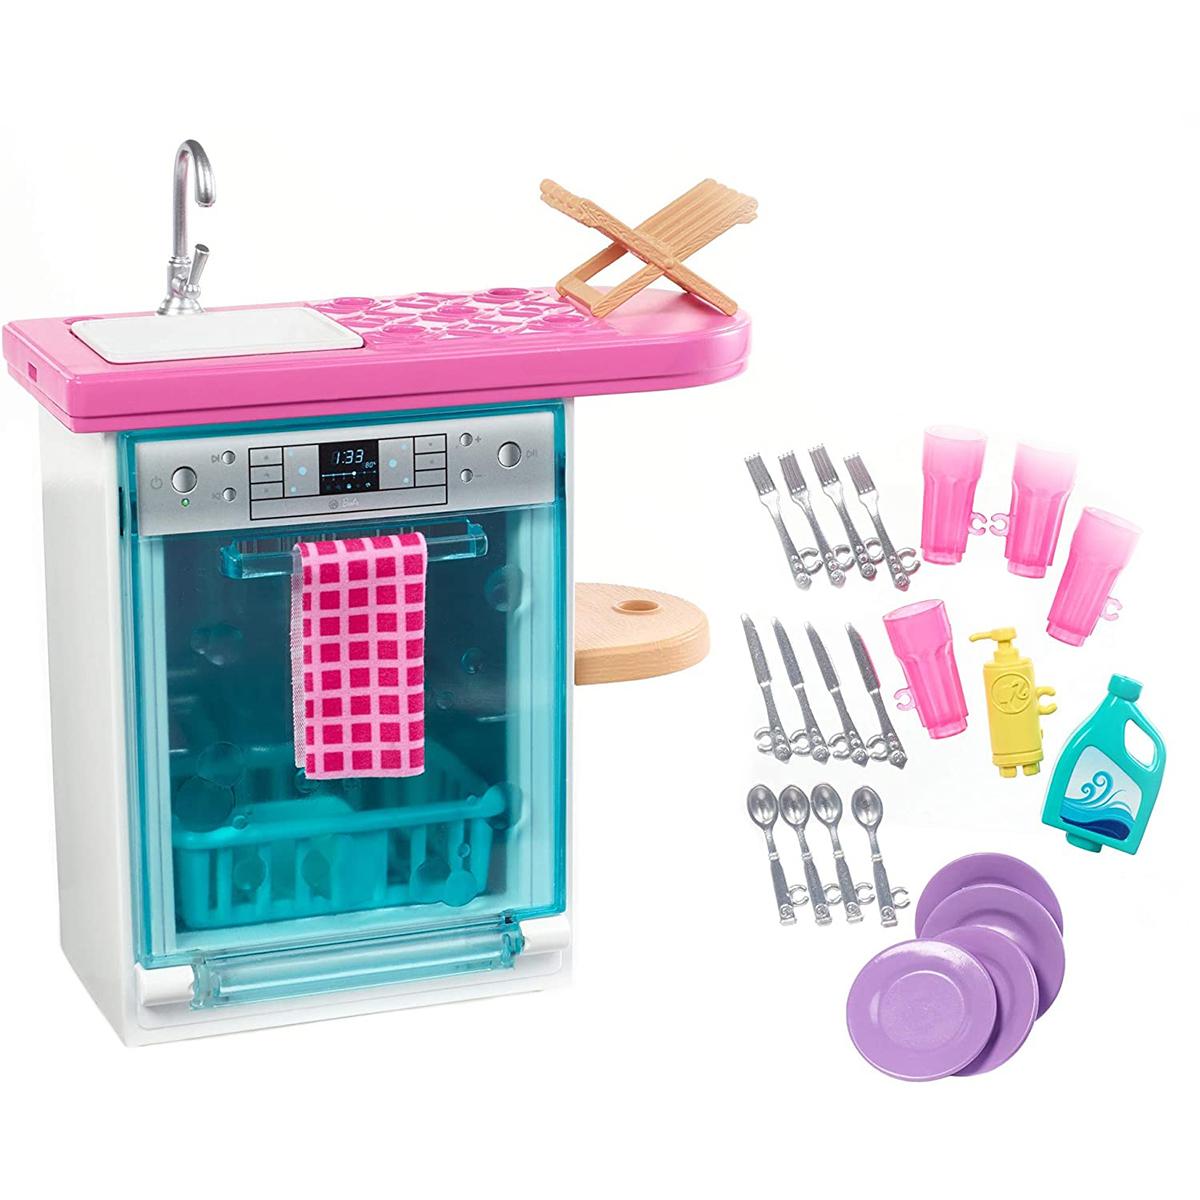 Set de joaca Barbie, Masina de spalat vase si accesorii, FXG35